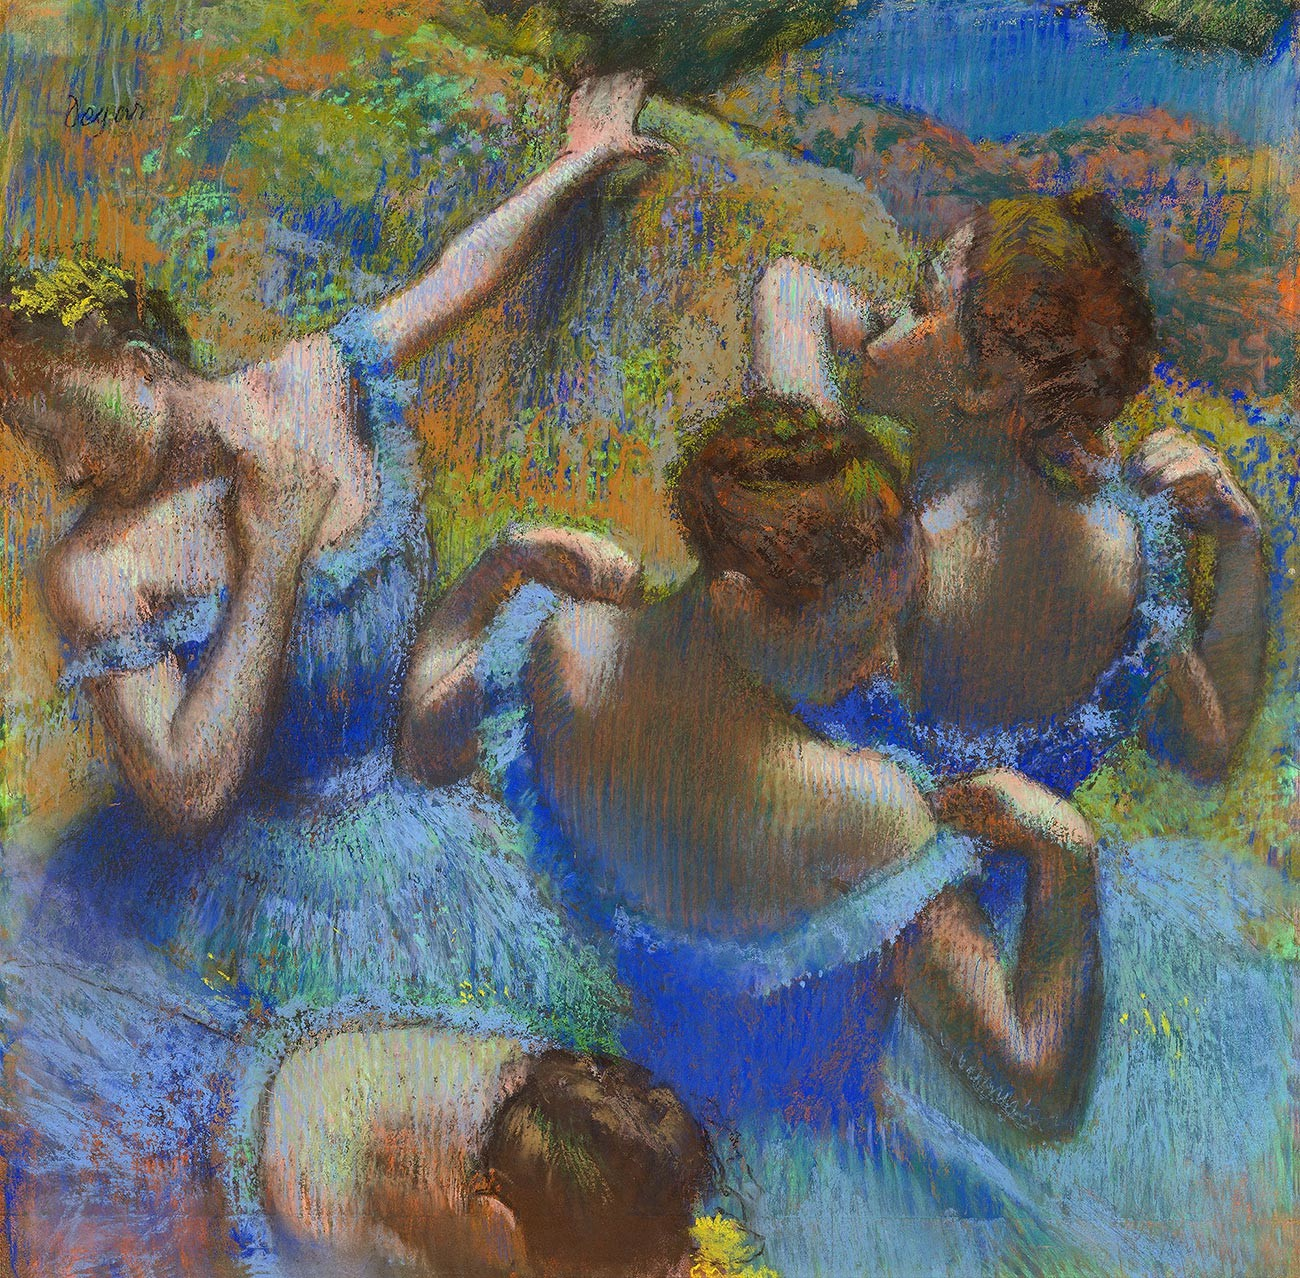 Эдгар Дега. «Голубые танцовщицы», 1897